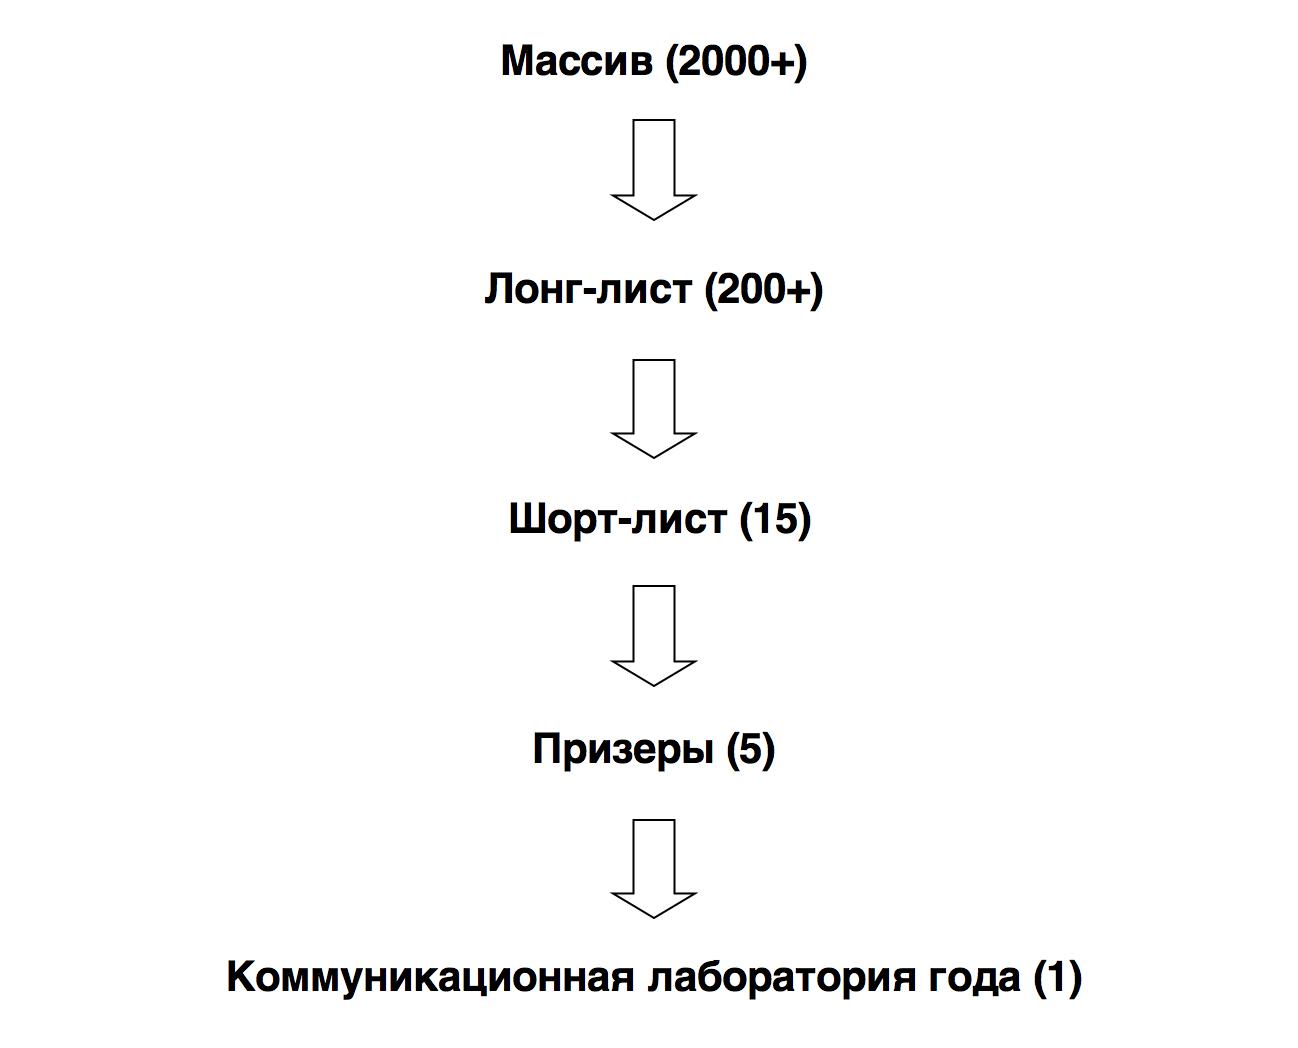 методология премии КомЛаб